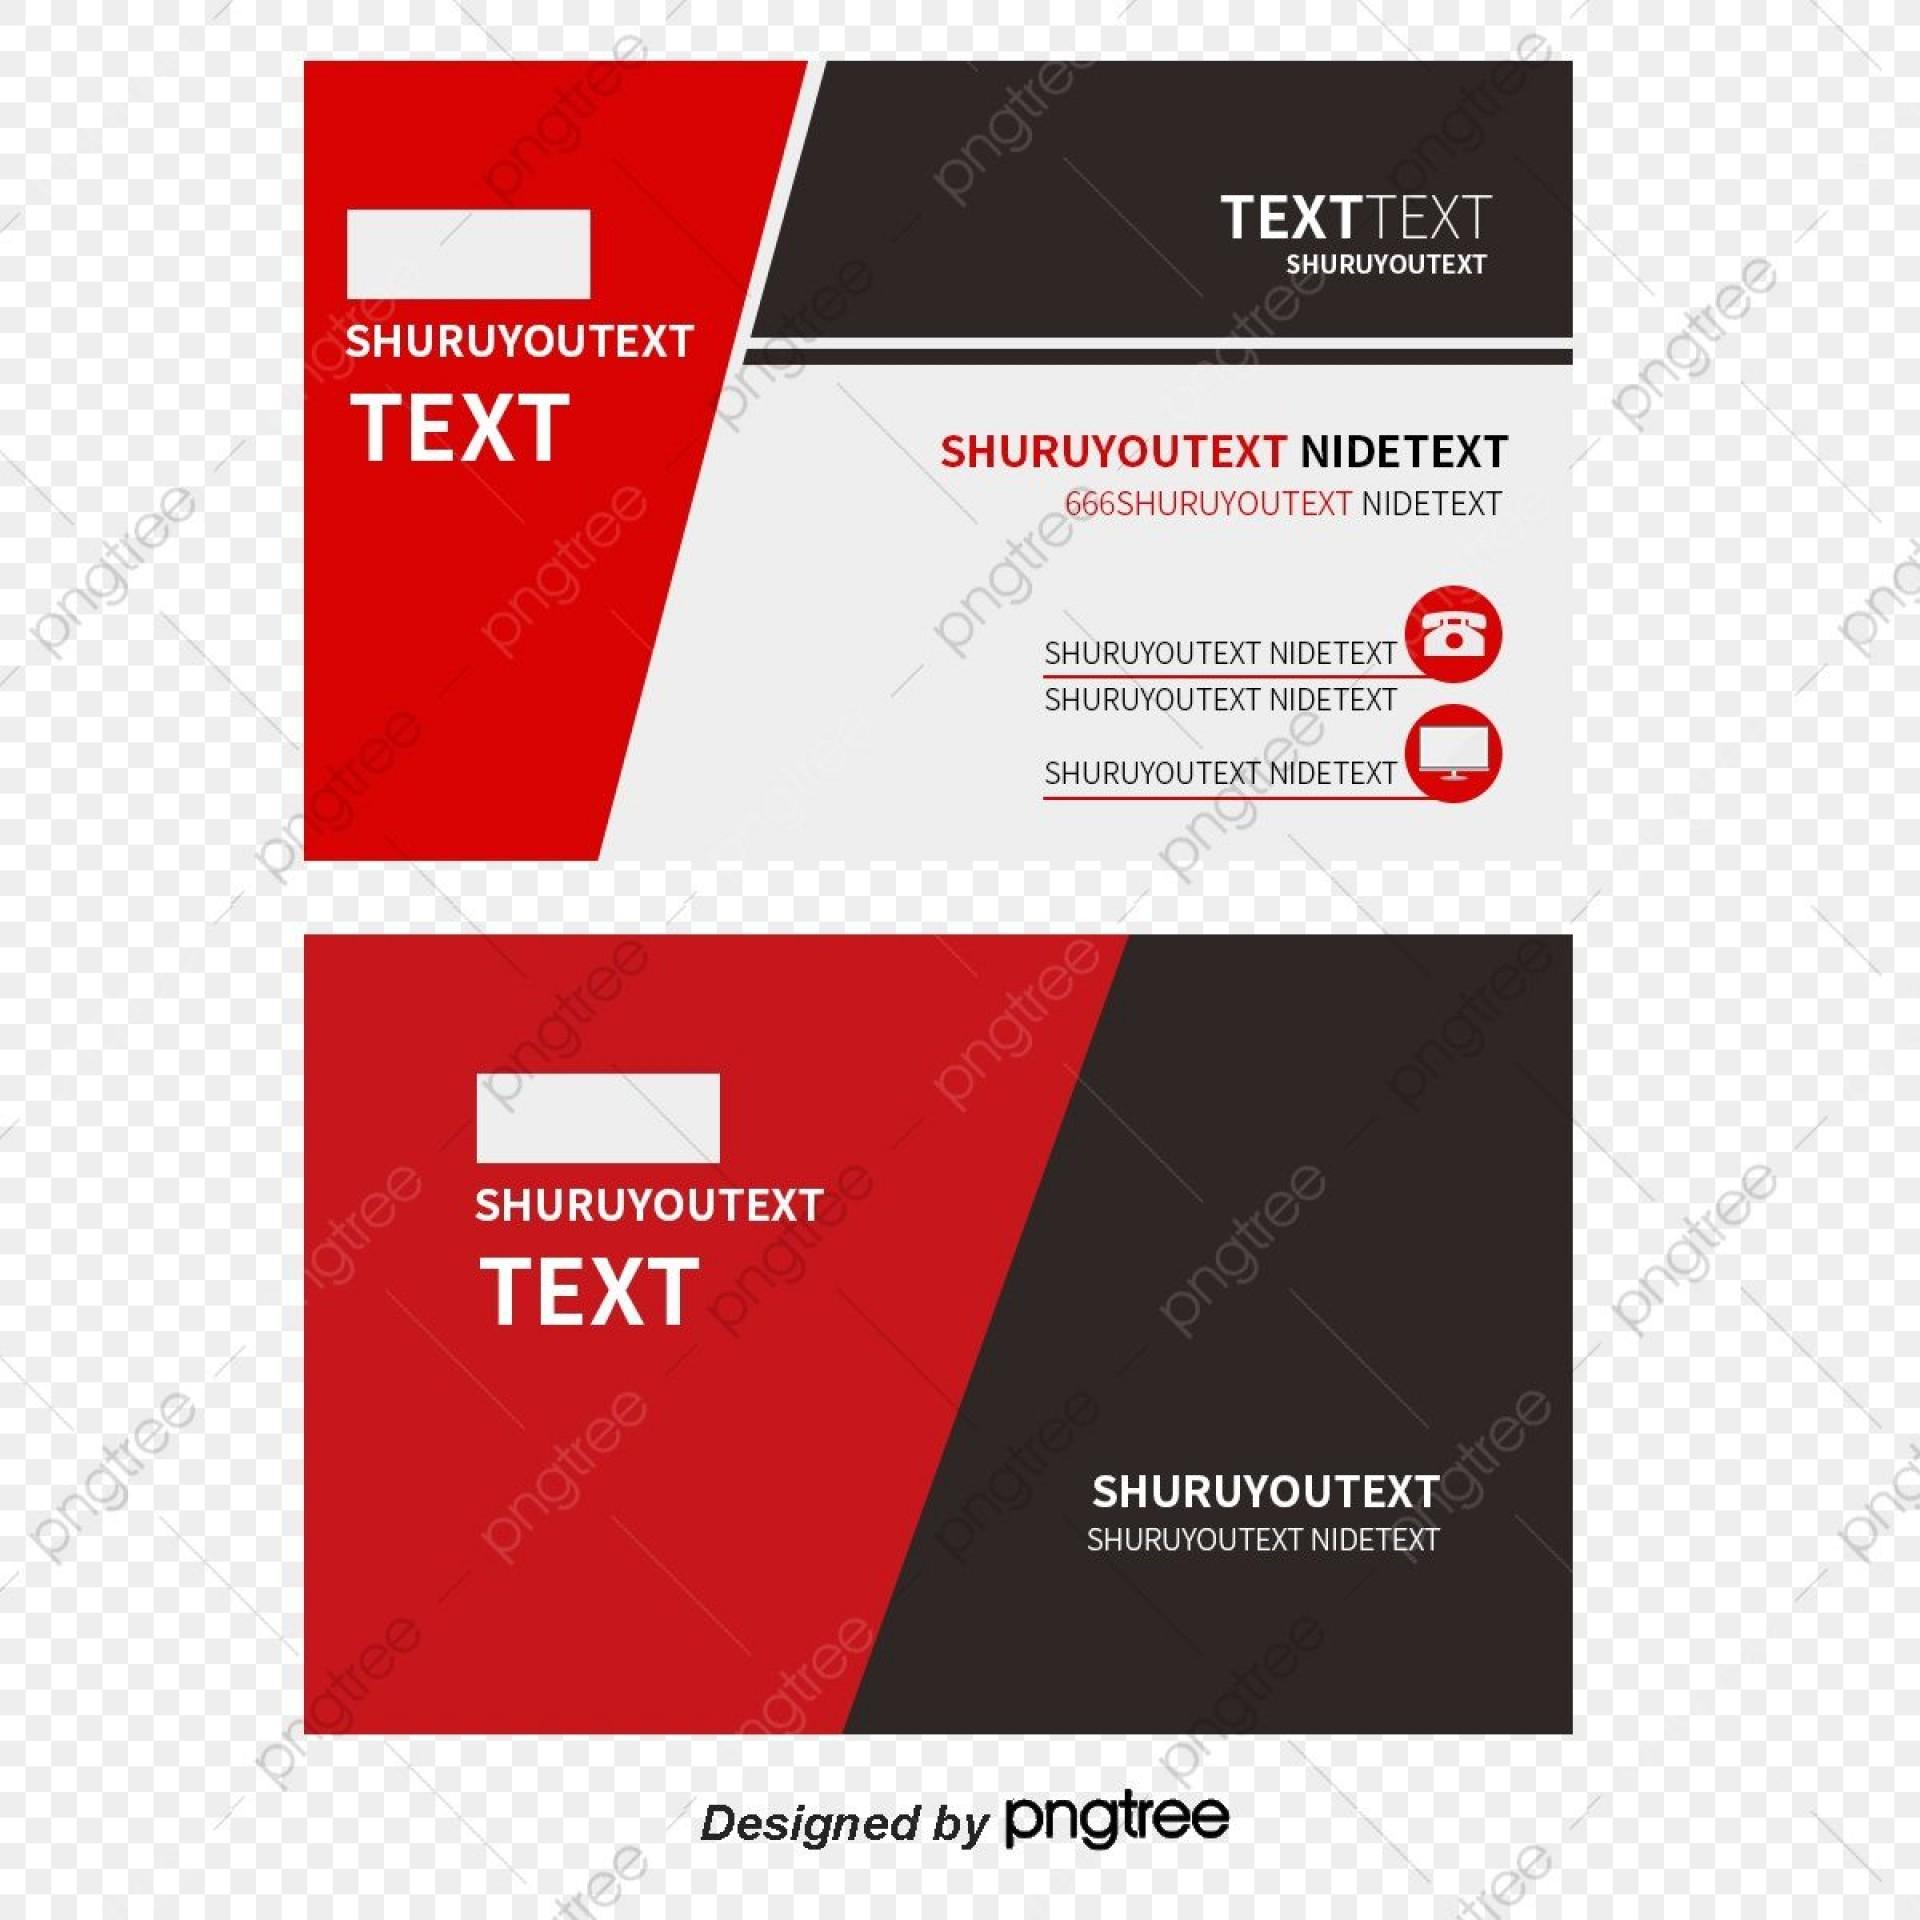 006 Impressive Simple Visiting Card Design Free Download Highest Quality  Busines Psd Coreldraw File1920